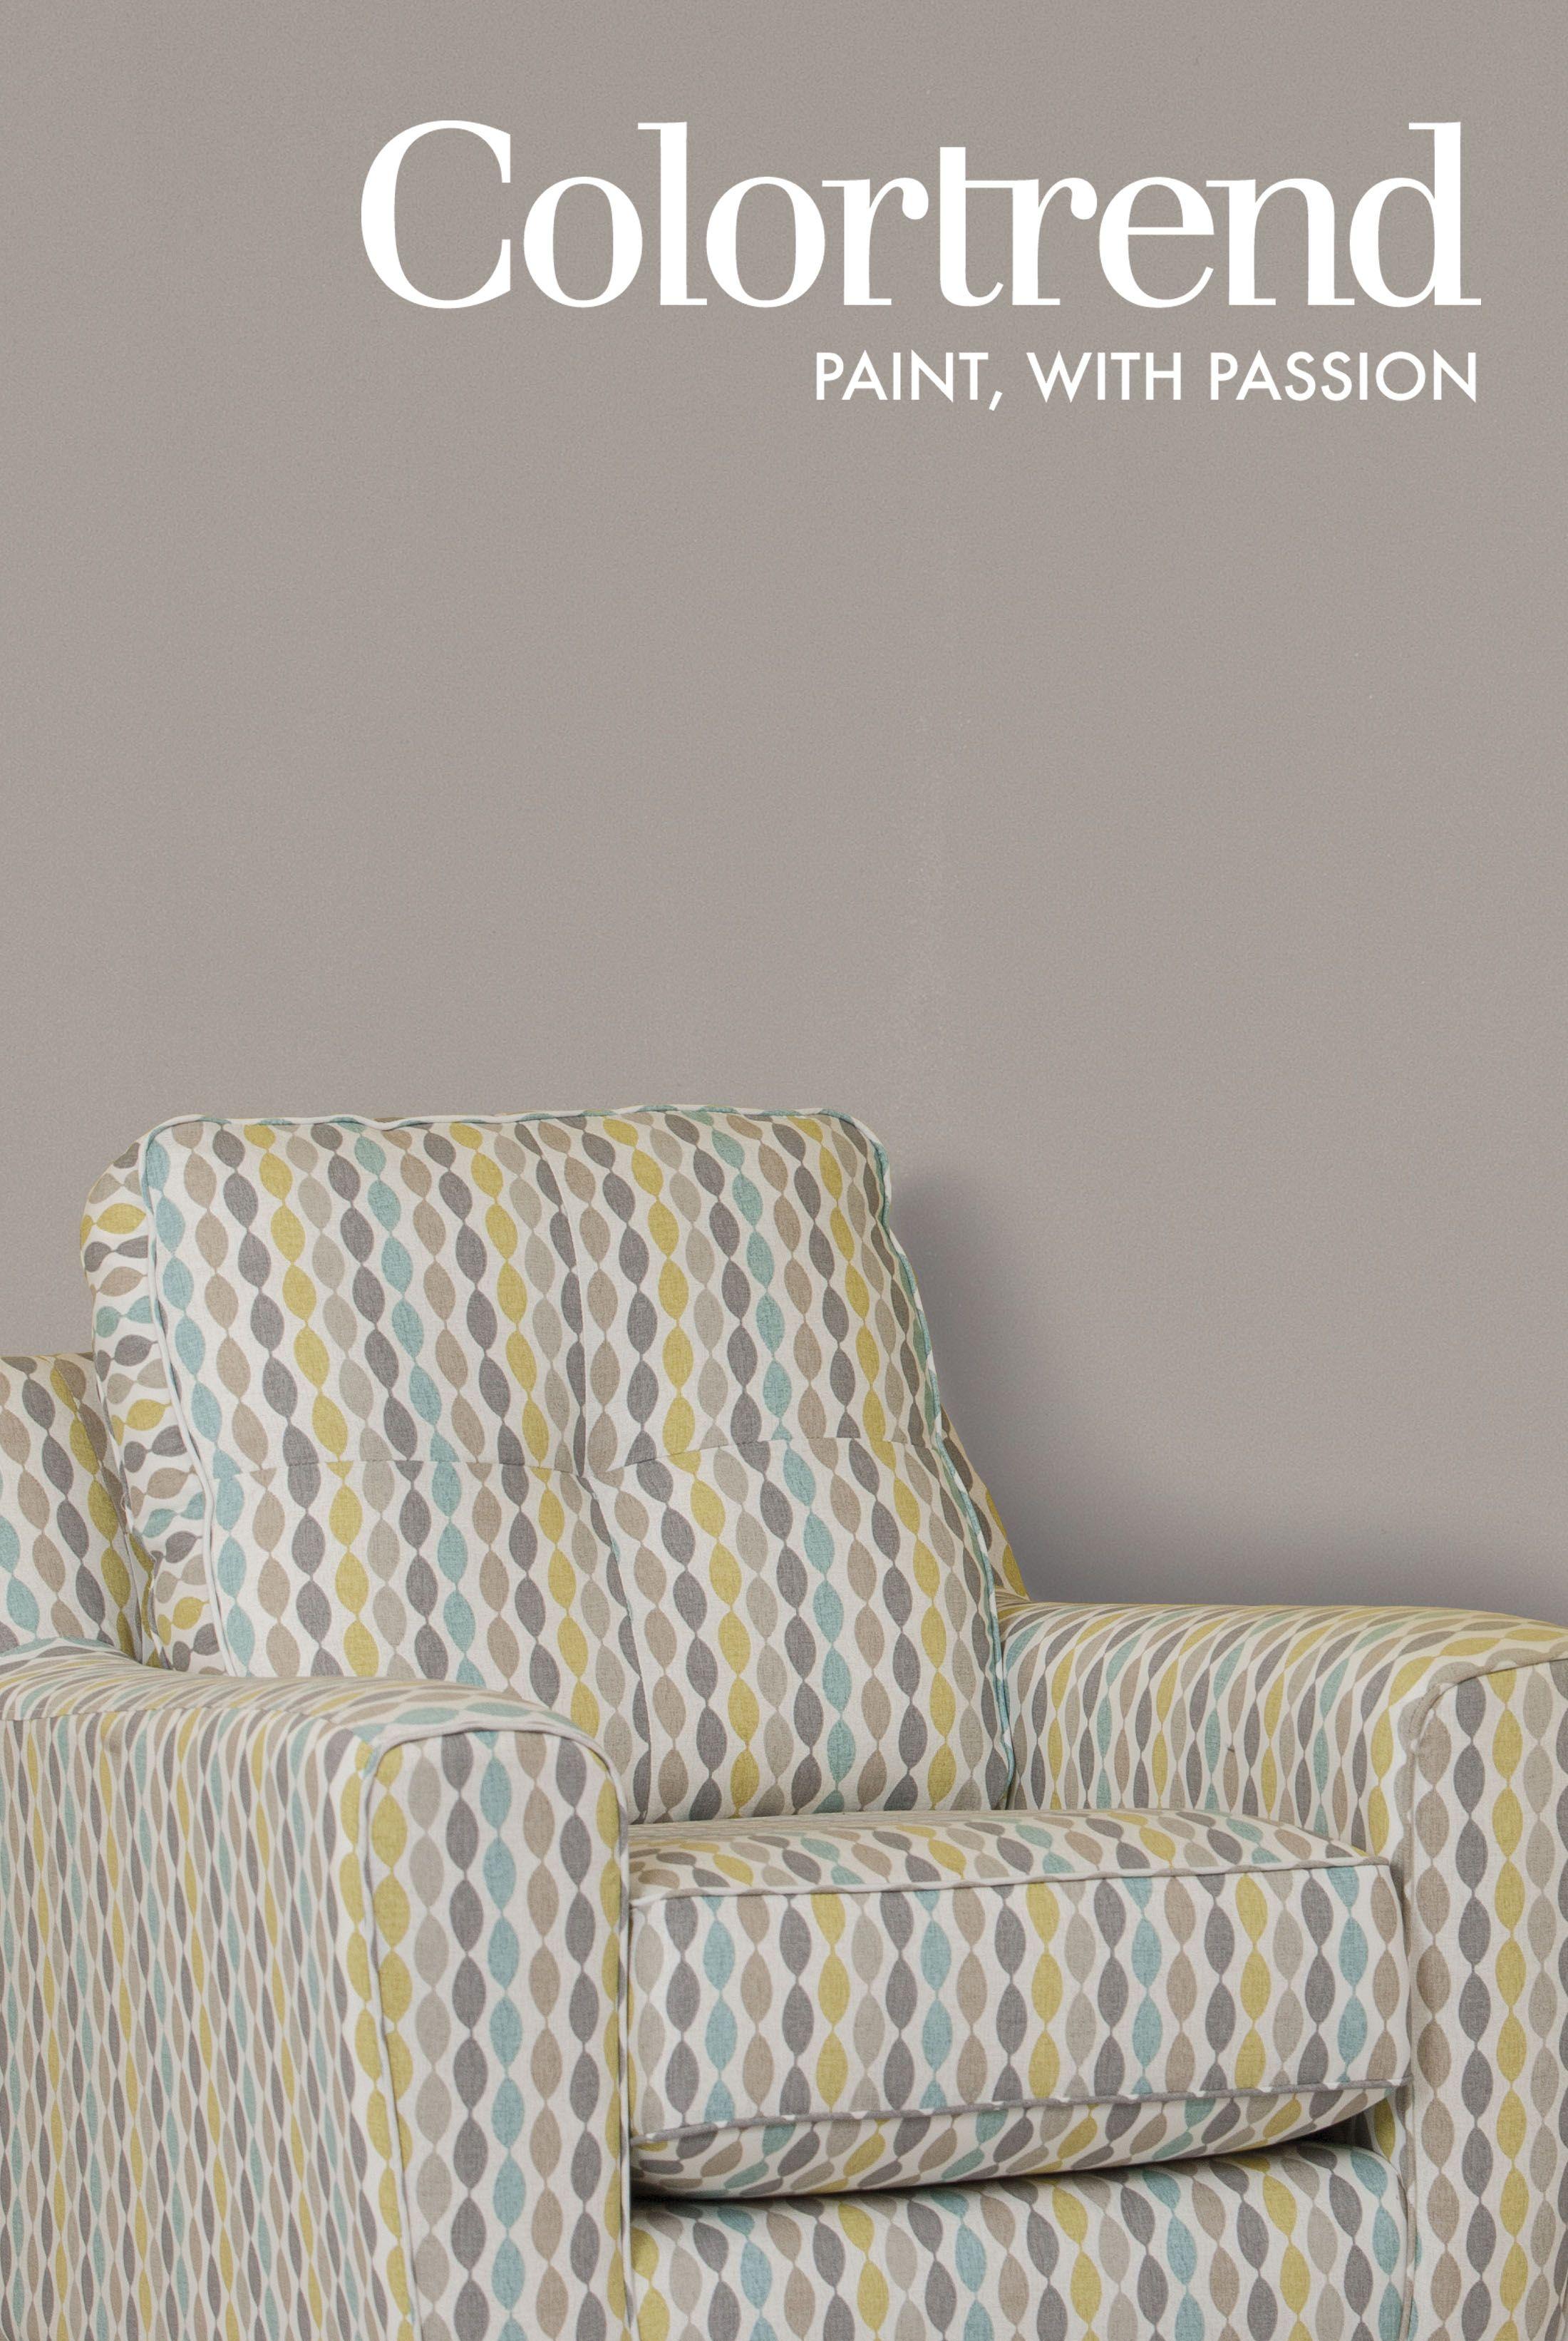 Walls Old Bone In Interior Matt Finish Www Colortrend Ie